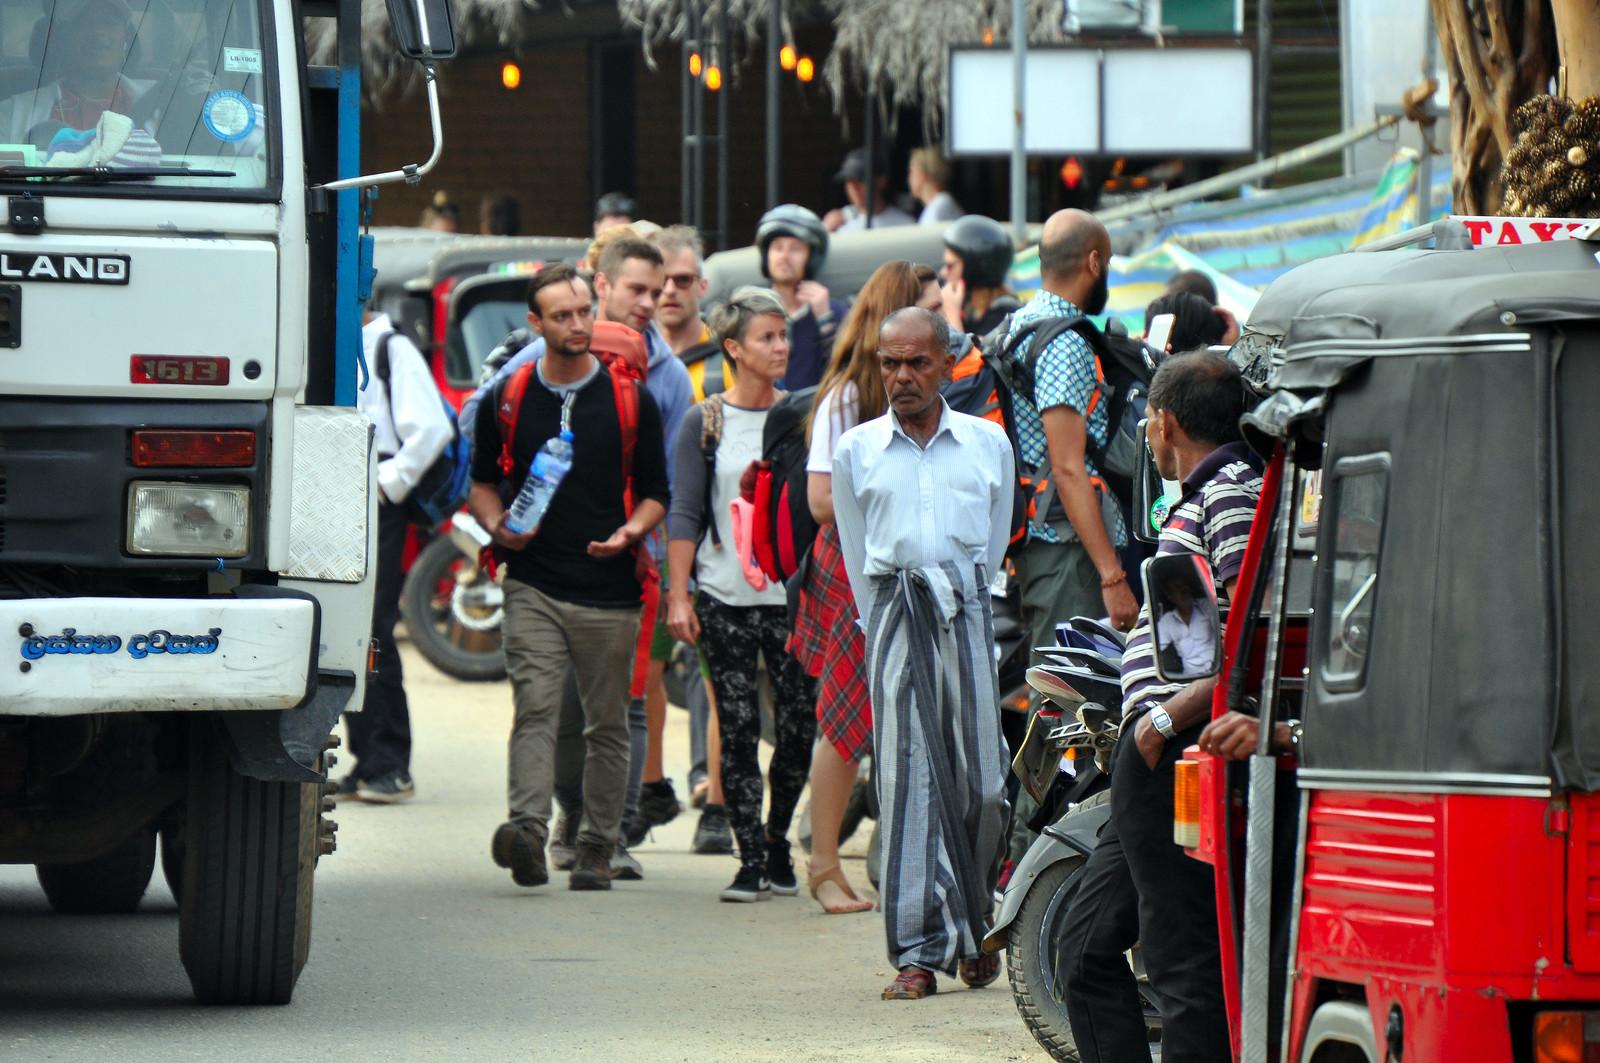 Tren de Ella, Ella Railway - Sri Lanka tren de ella - 39931039233 3f4f7a0f6f h - Tren de Ella en Sri Lanka: ¿El viaje en tren más pintoresco del mundo?